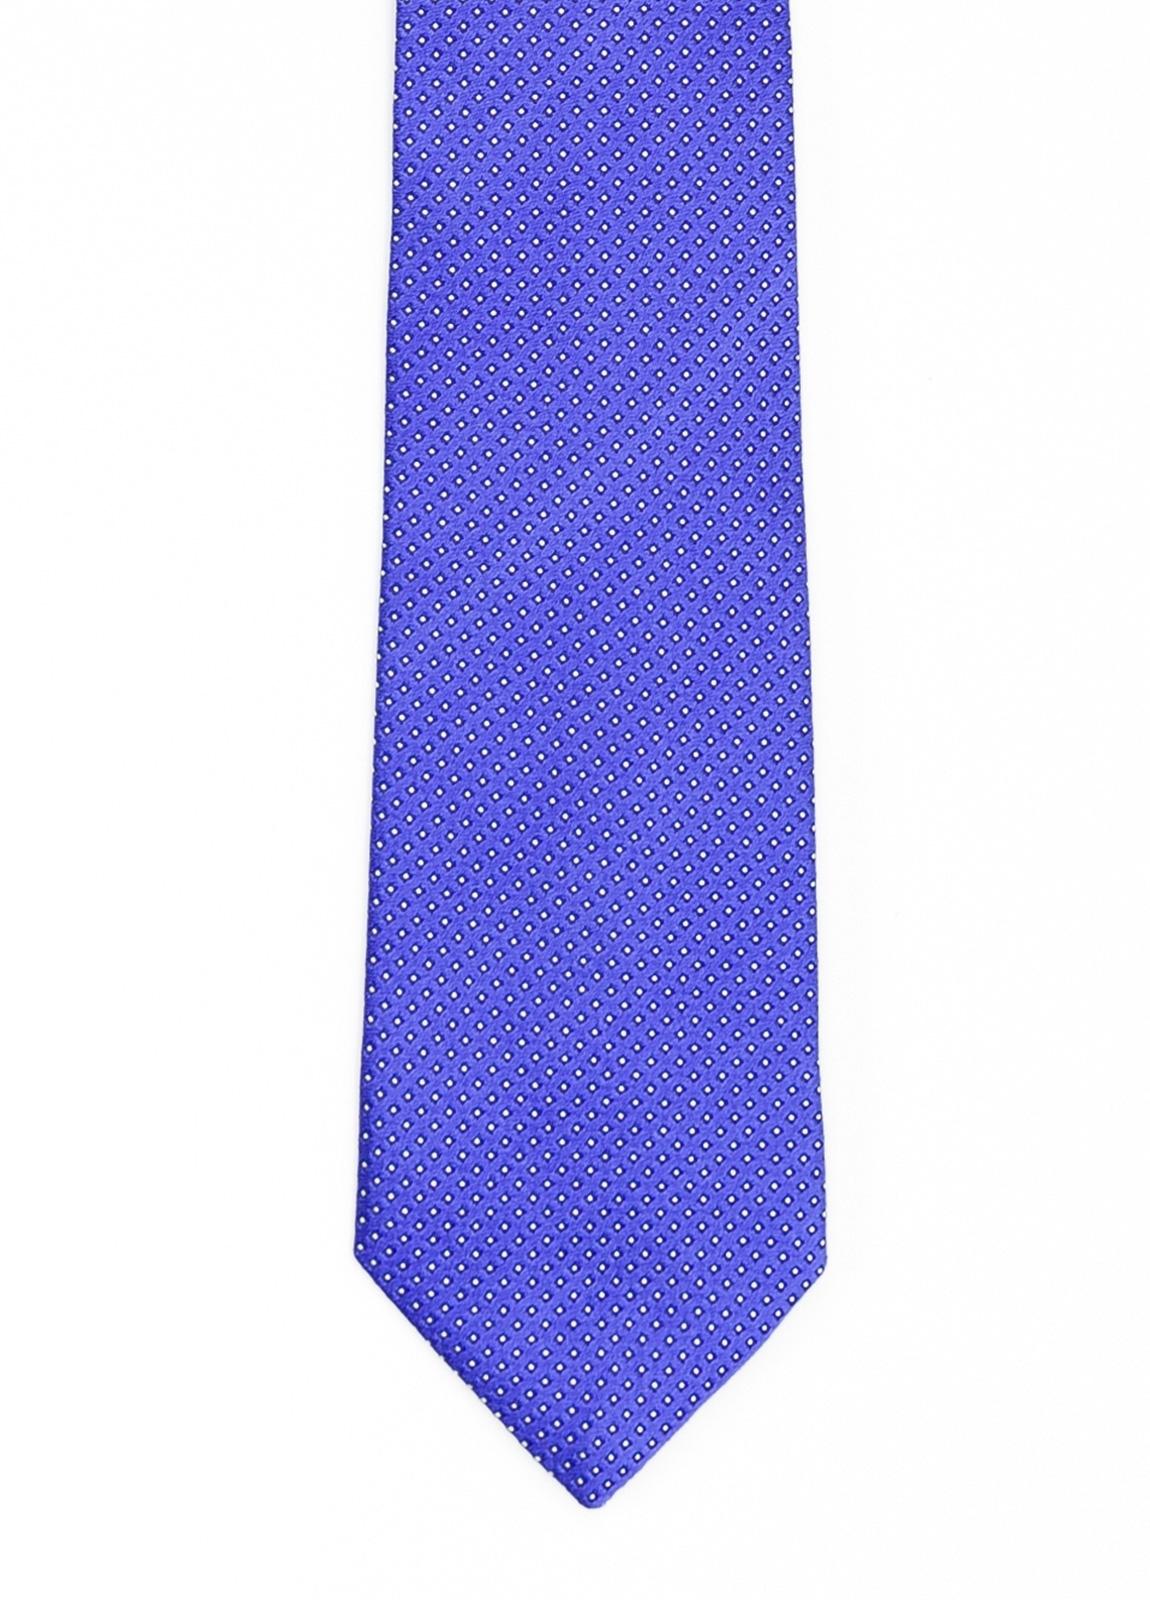 Corbata Formal Wear microdibujo color rojo. Pala 7,5 cm. 100% Seda.